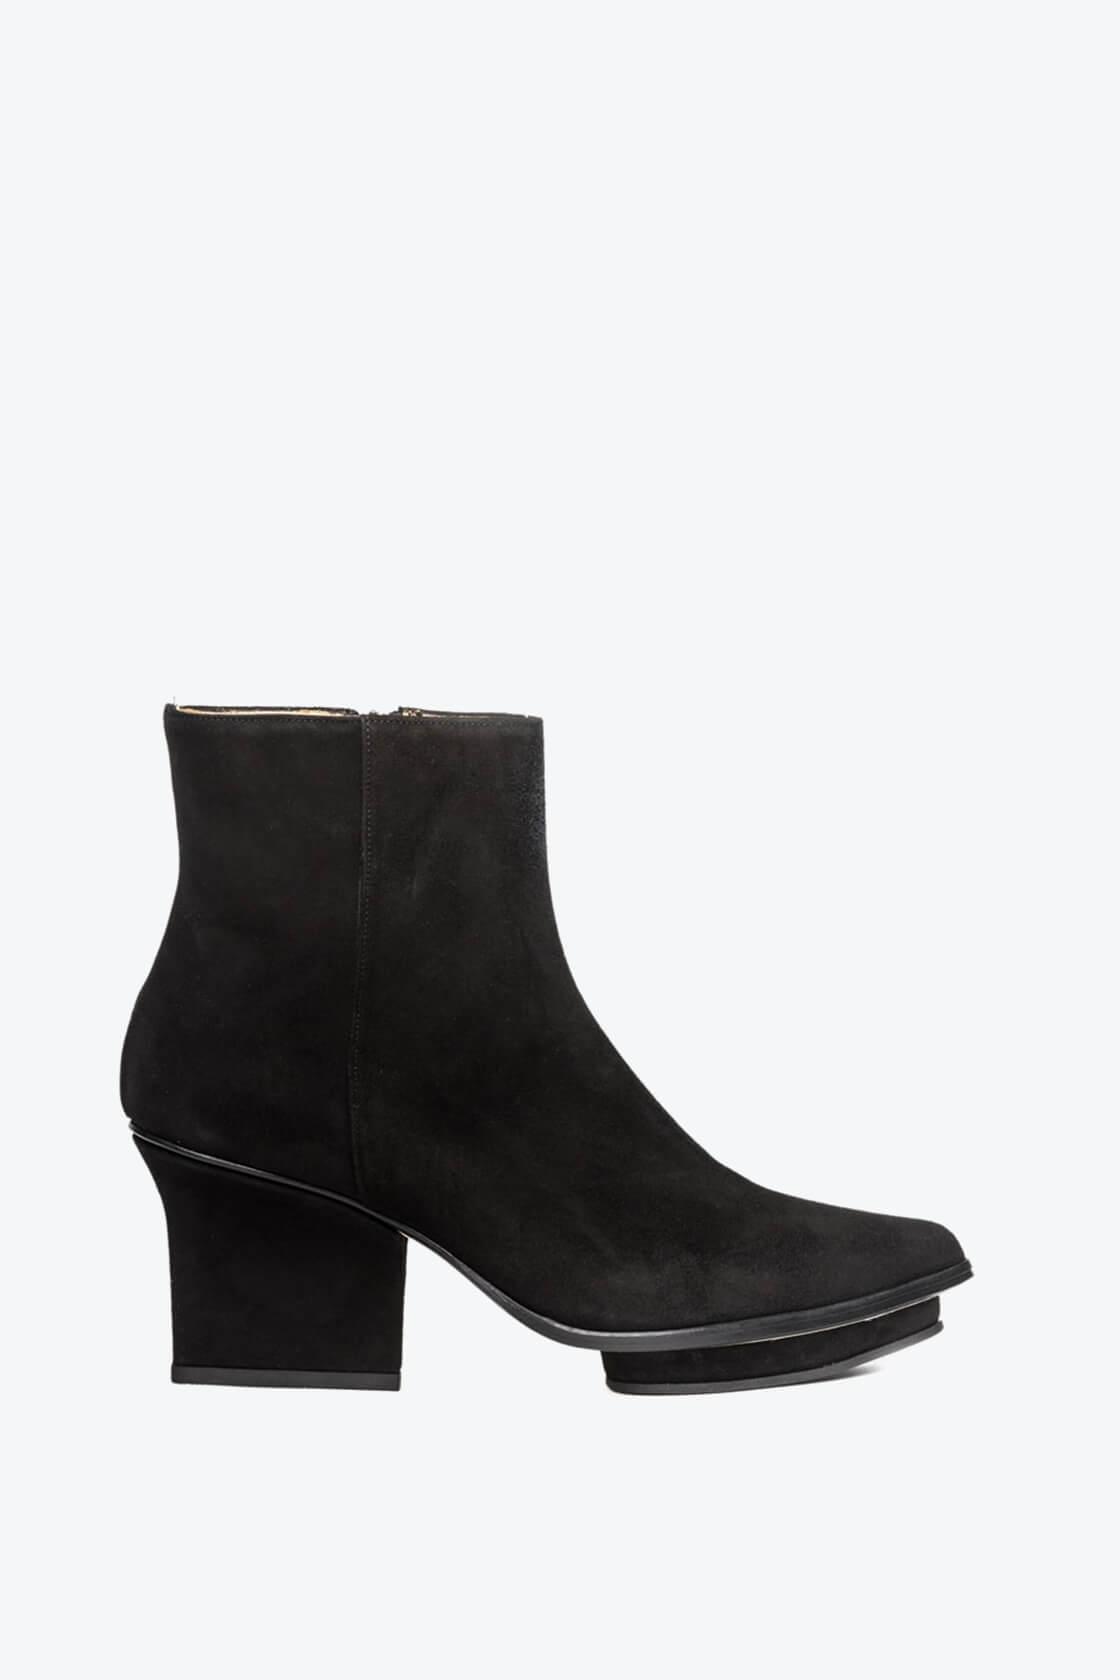 EJK0000084 Roger ankle boots black suede 1